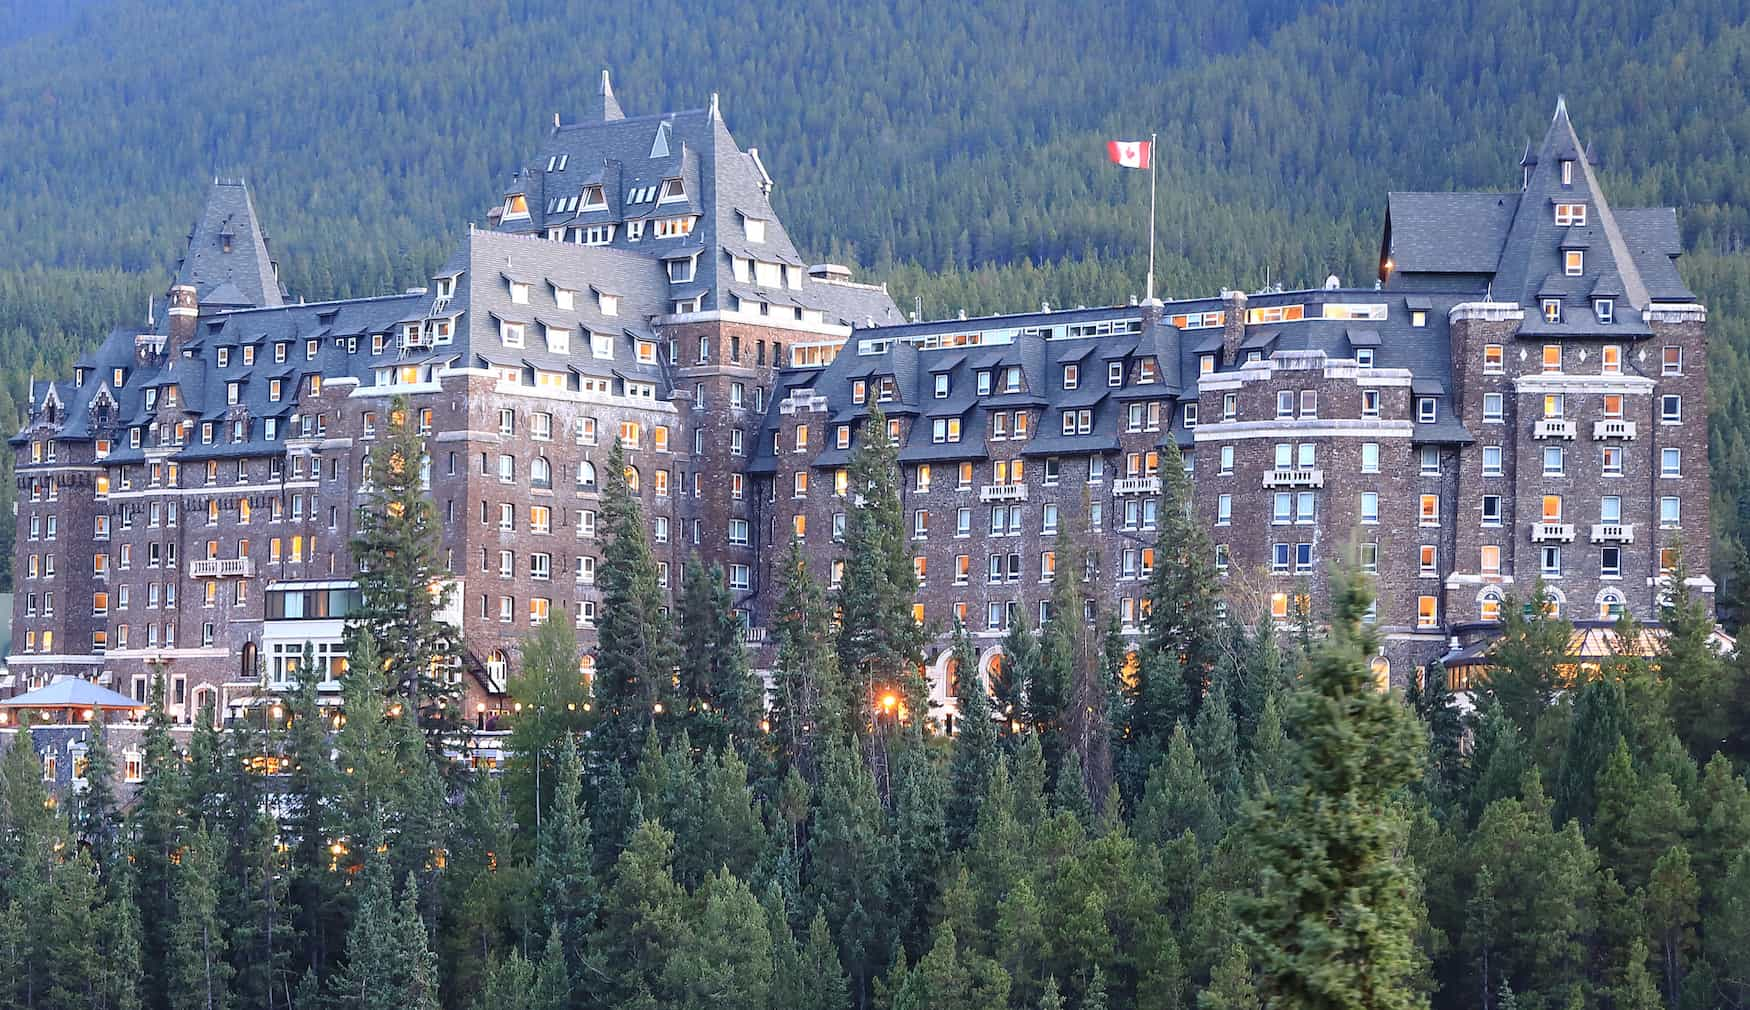 Fairmont Spring Hotel. Banff, Alberta, Kanada